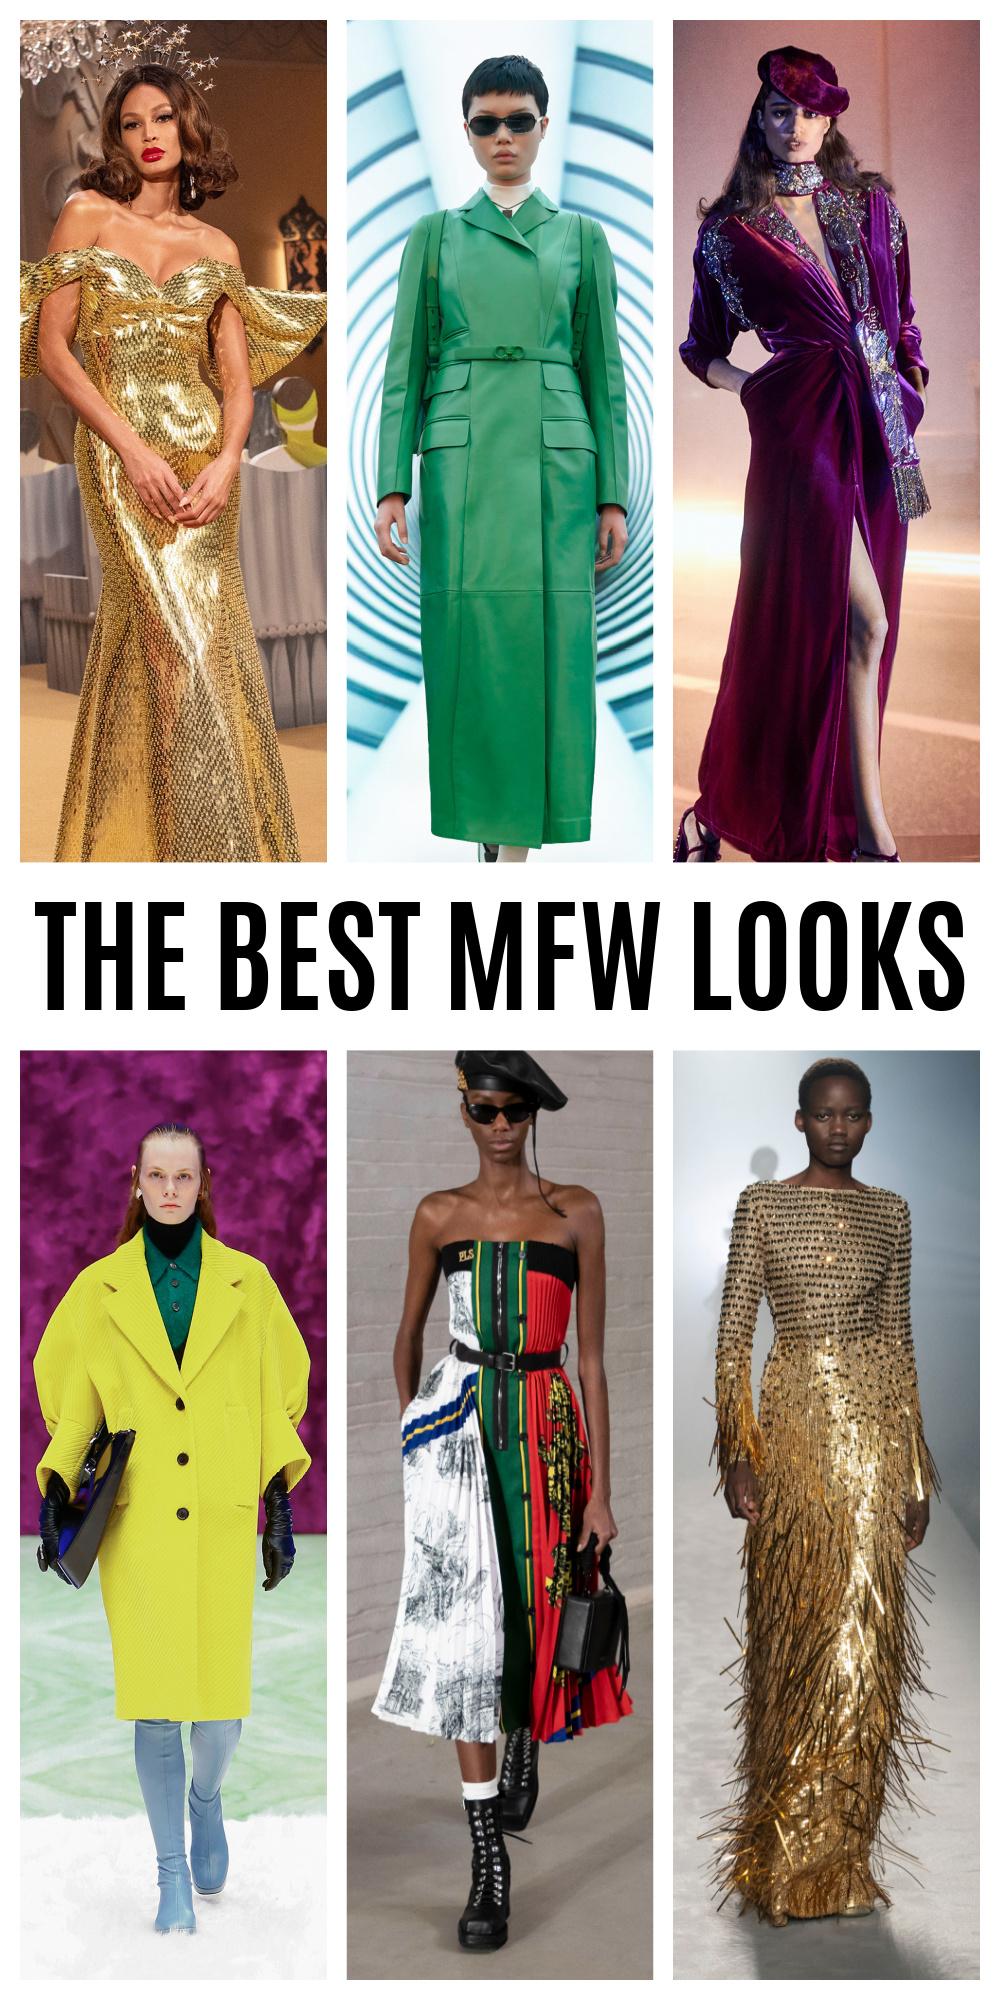 The Best MFW Looks of the Fall 2021 Season I Dreaminlace.com #fashionblog #fallfashion #runway #outfitinspo #fashionstyle